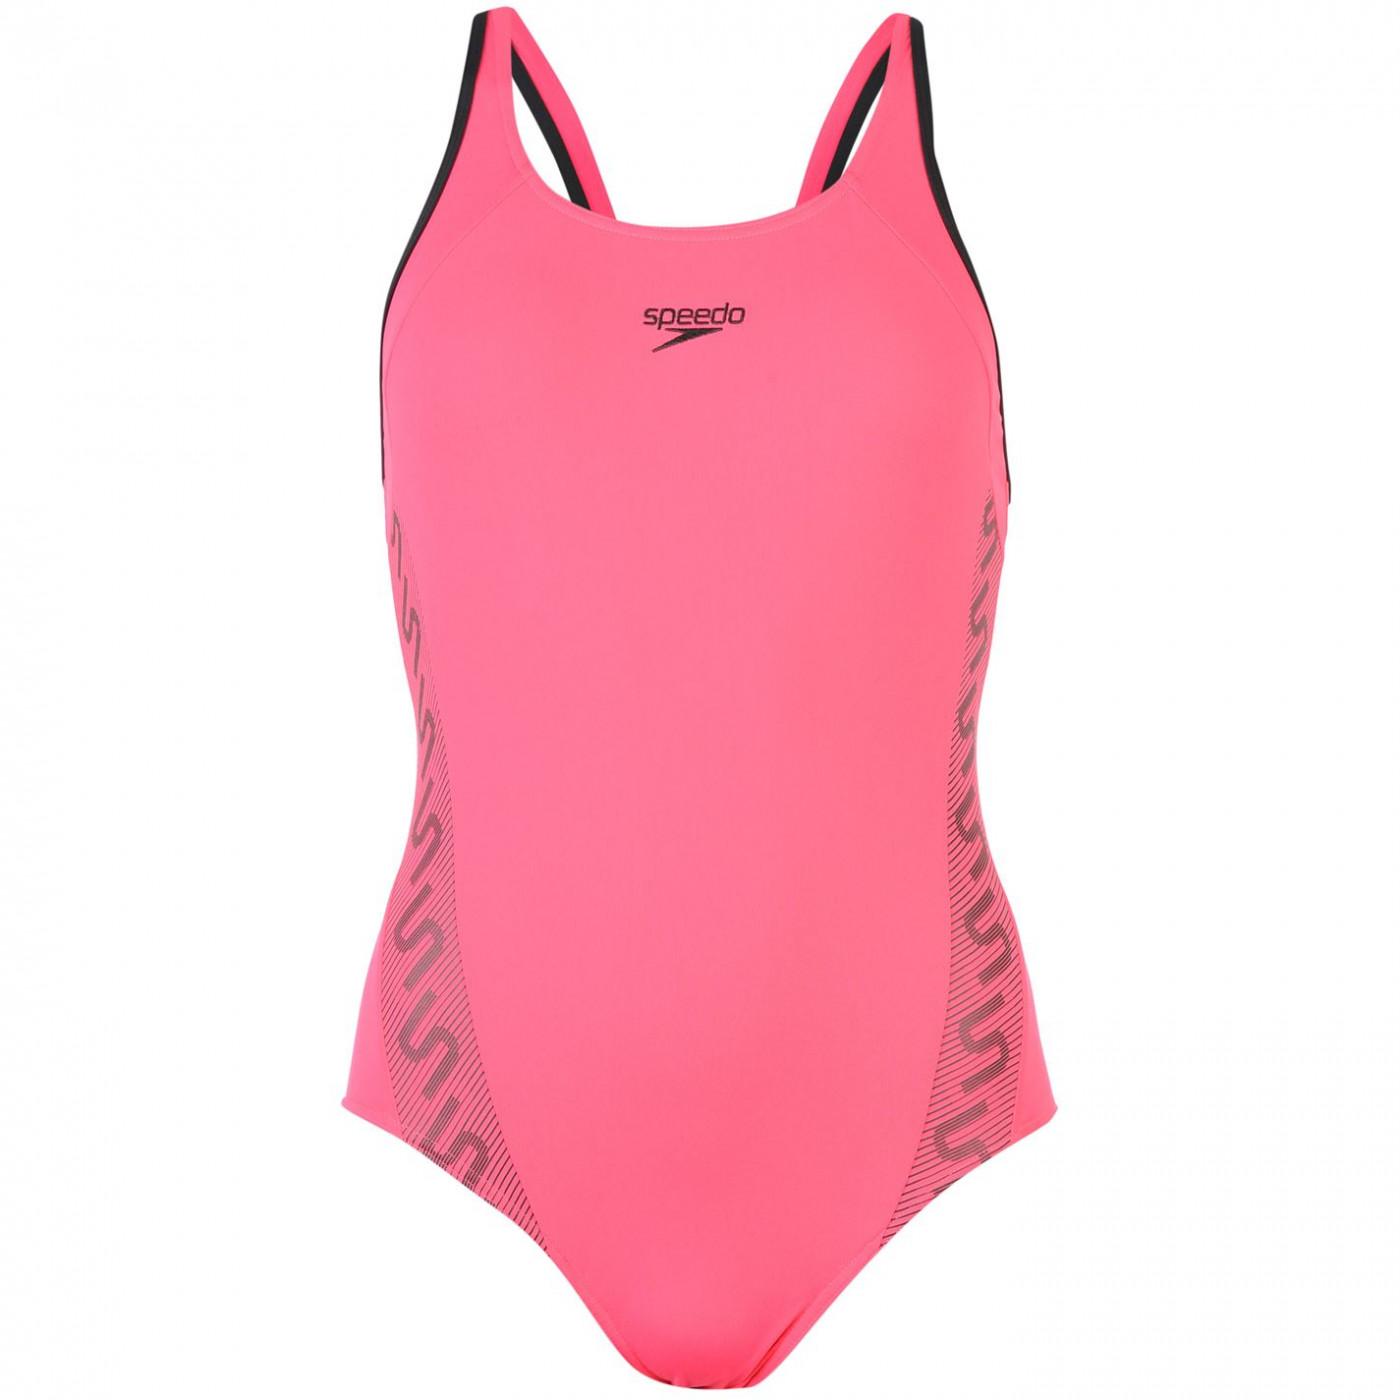 Speedo Monogram Muscle Back Swimsuit Ladies